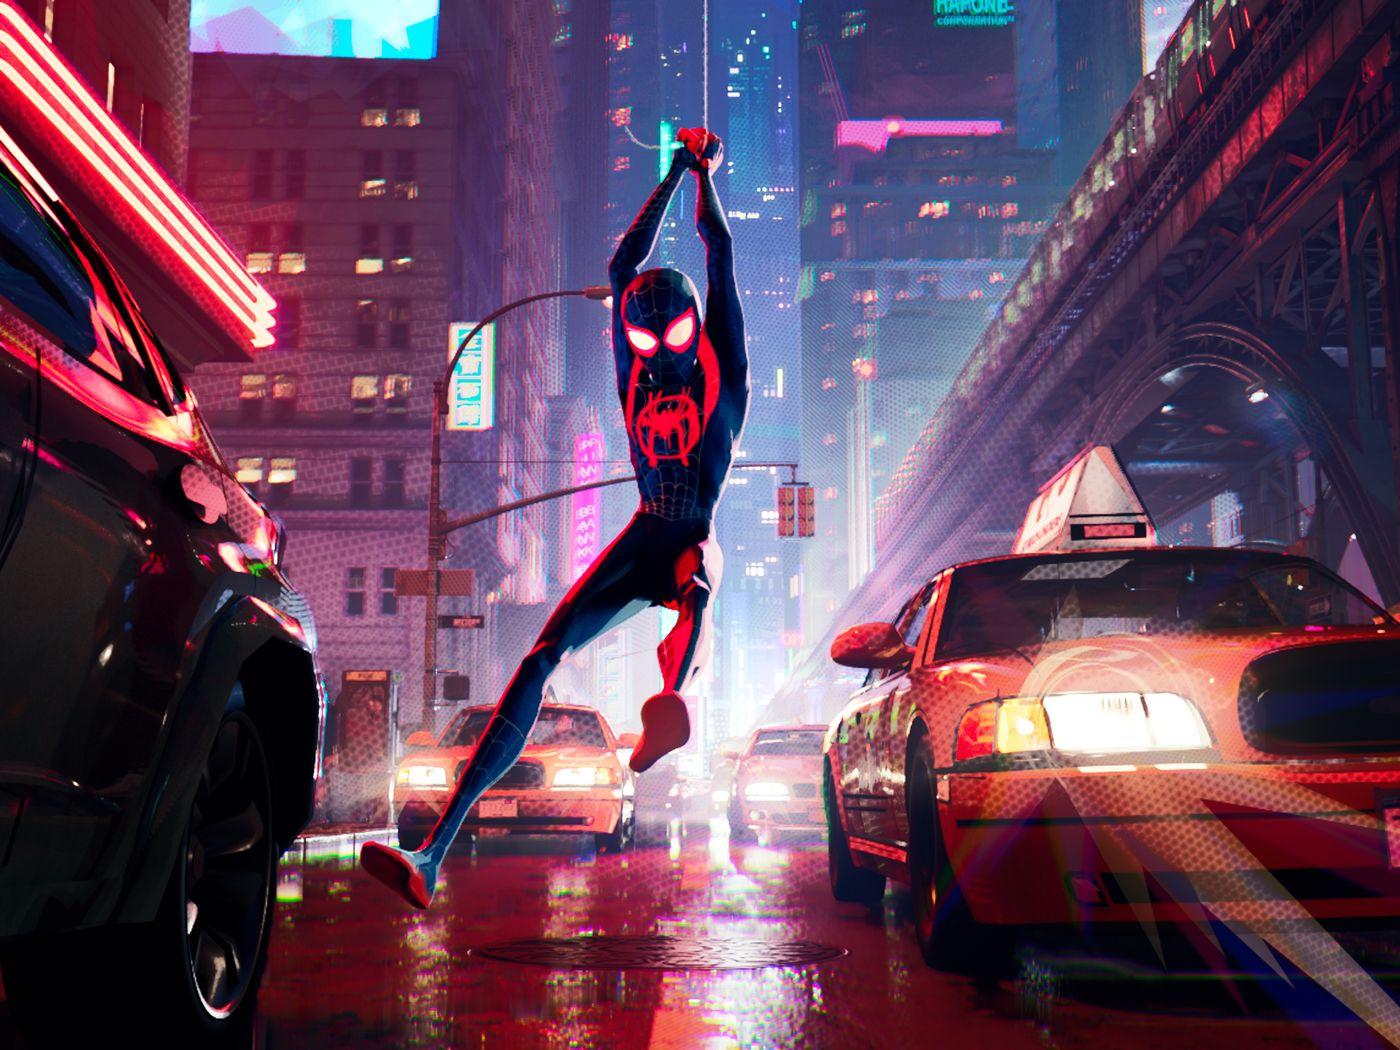 Spider-Man: Into the Spider-Verse นั้นตื่นตาเฮฮาและไม่เหมือนใคร